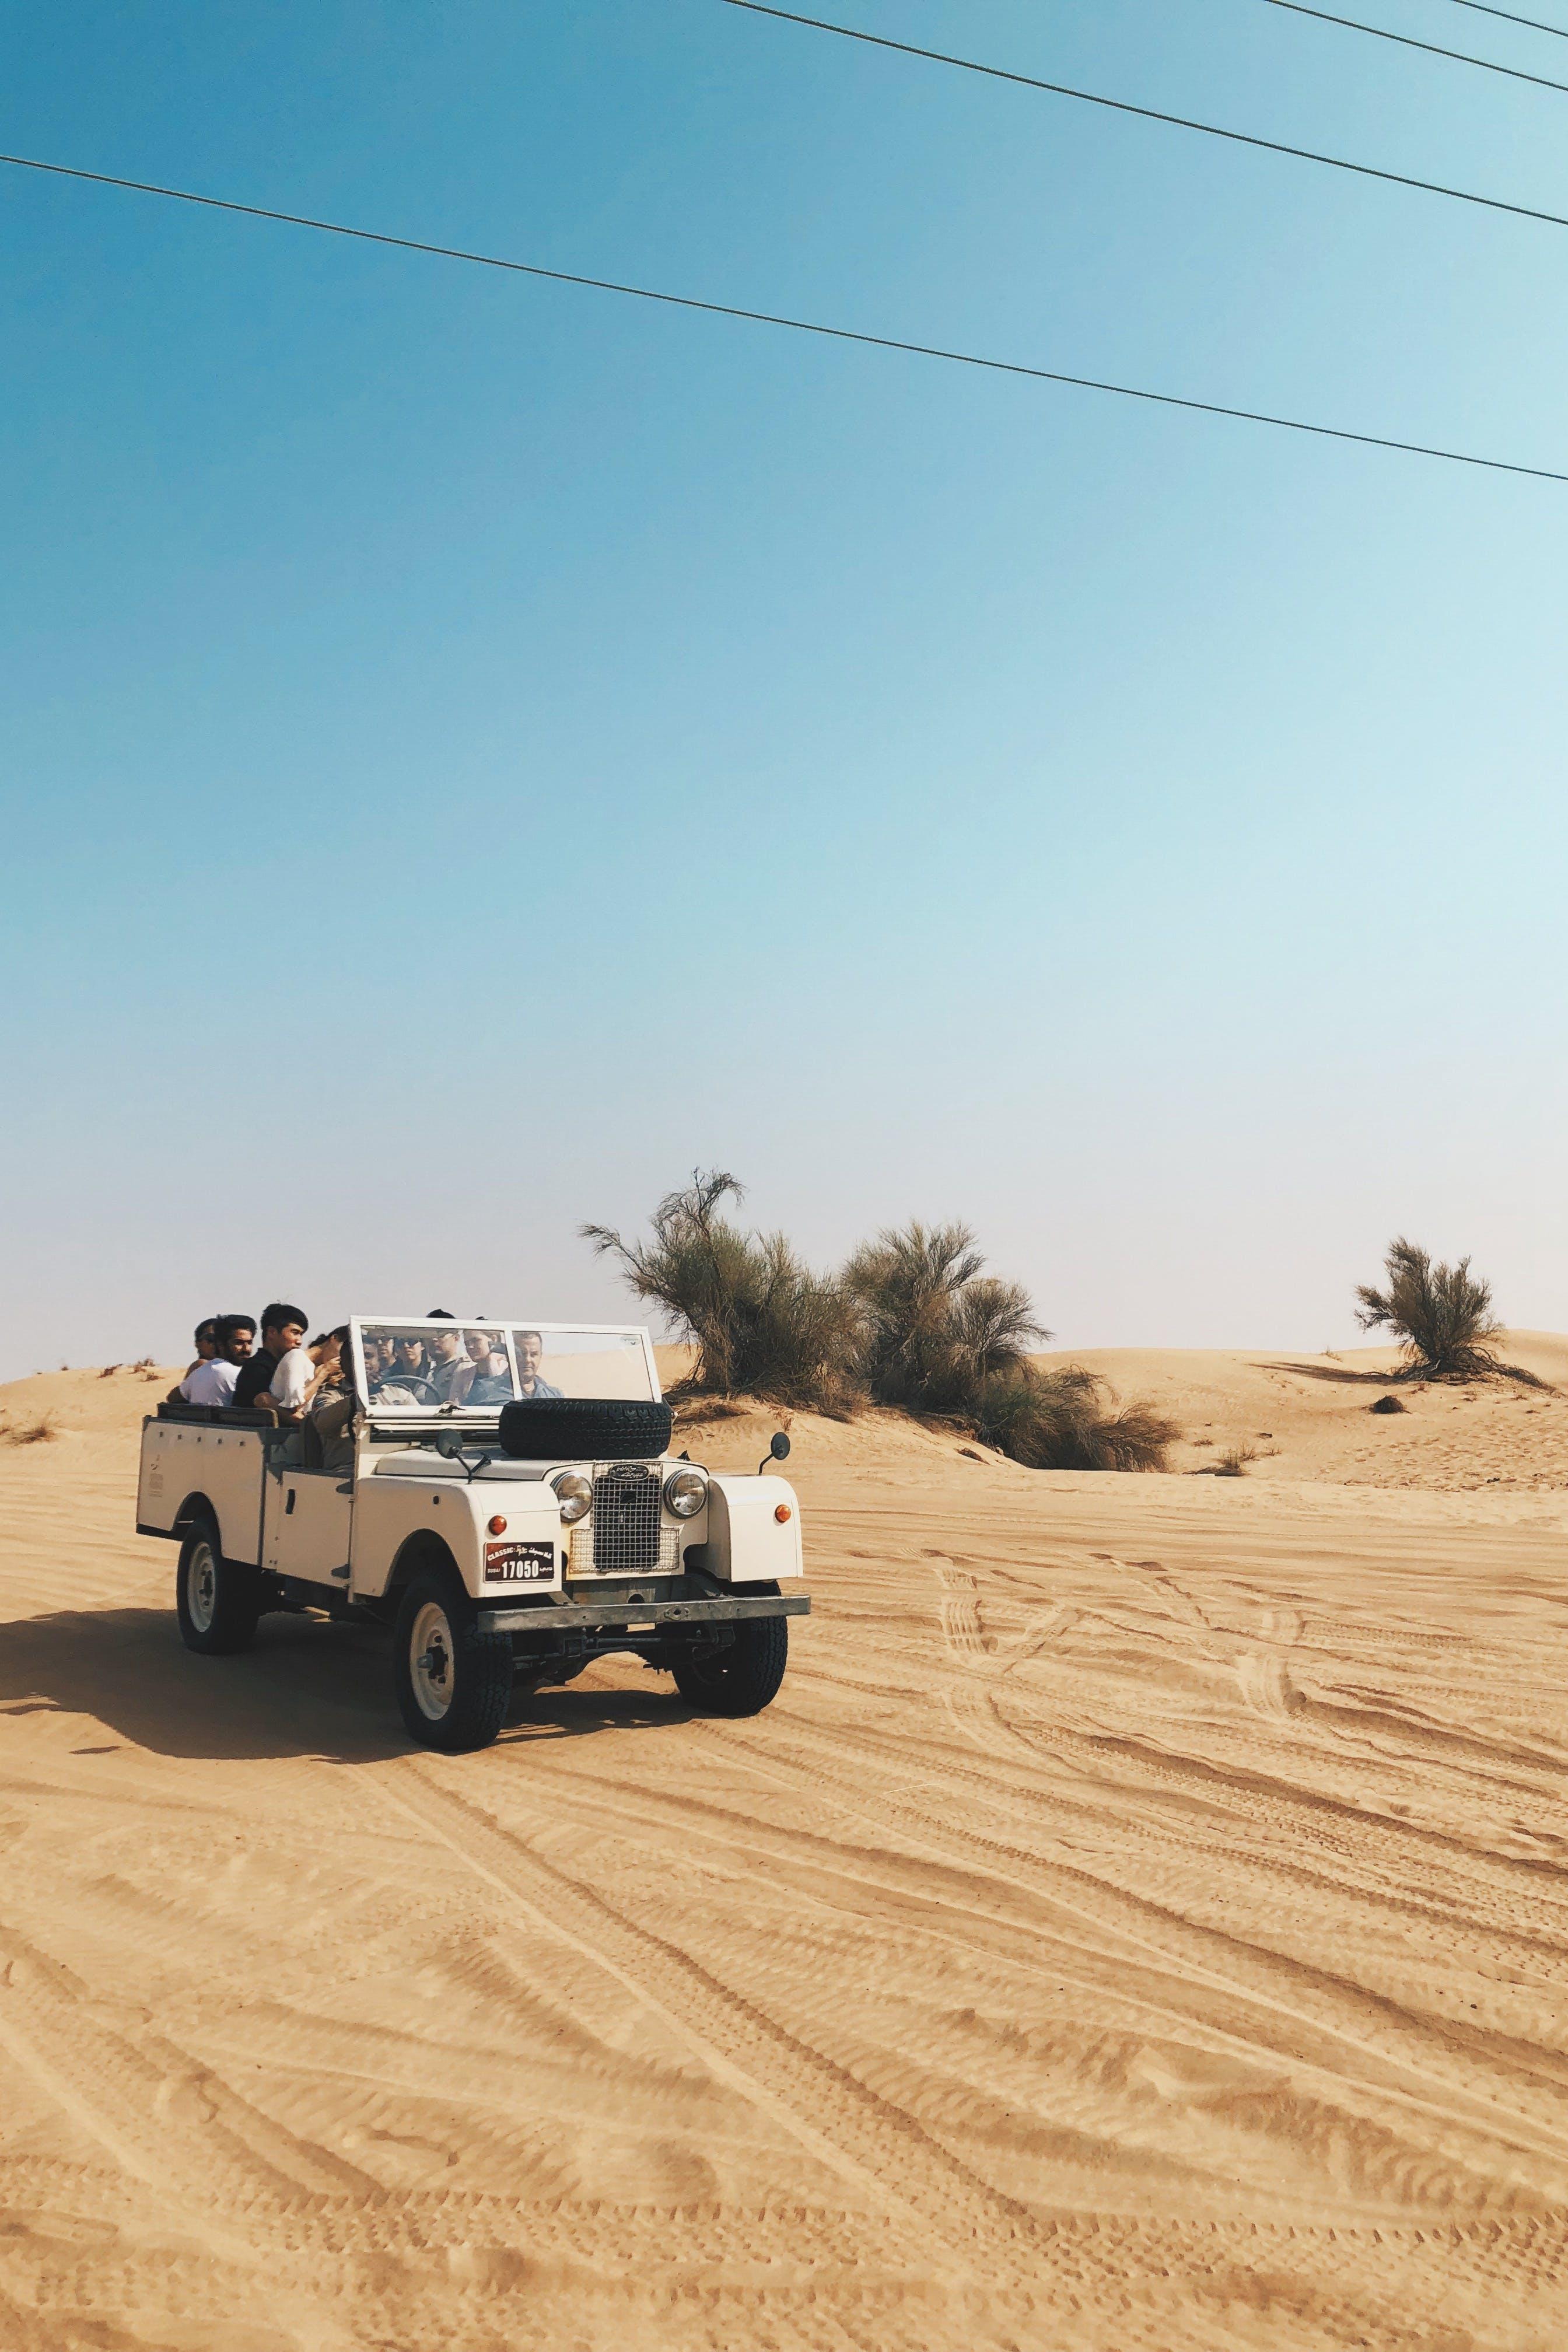 People Riding Vehicle on Desert